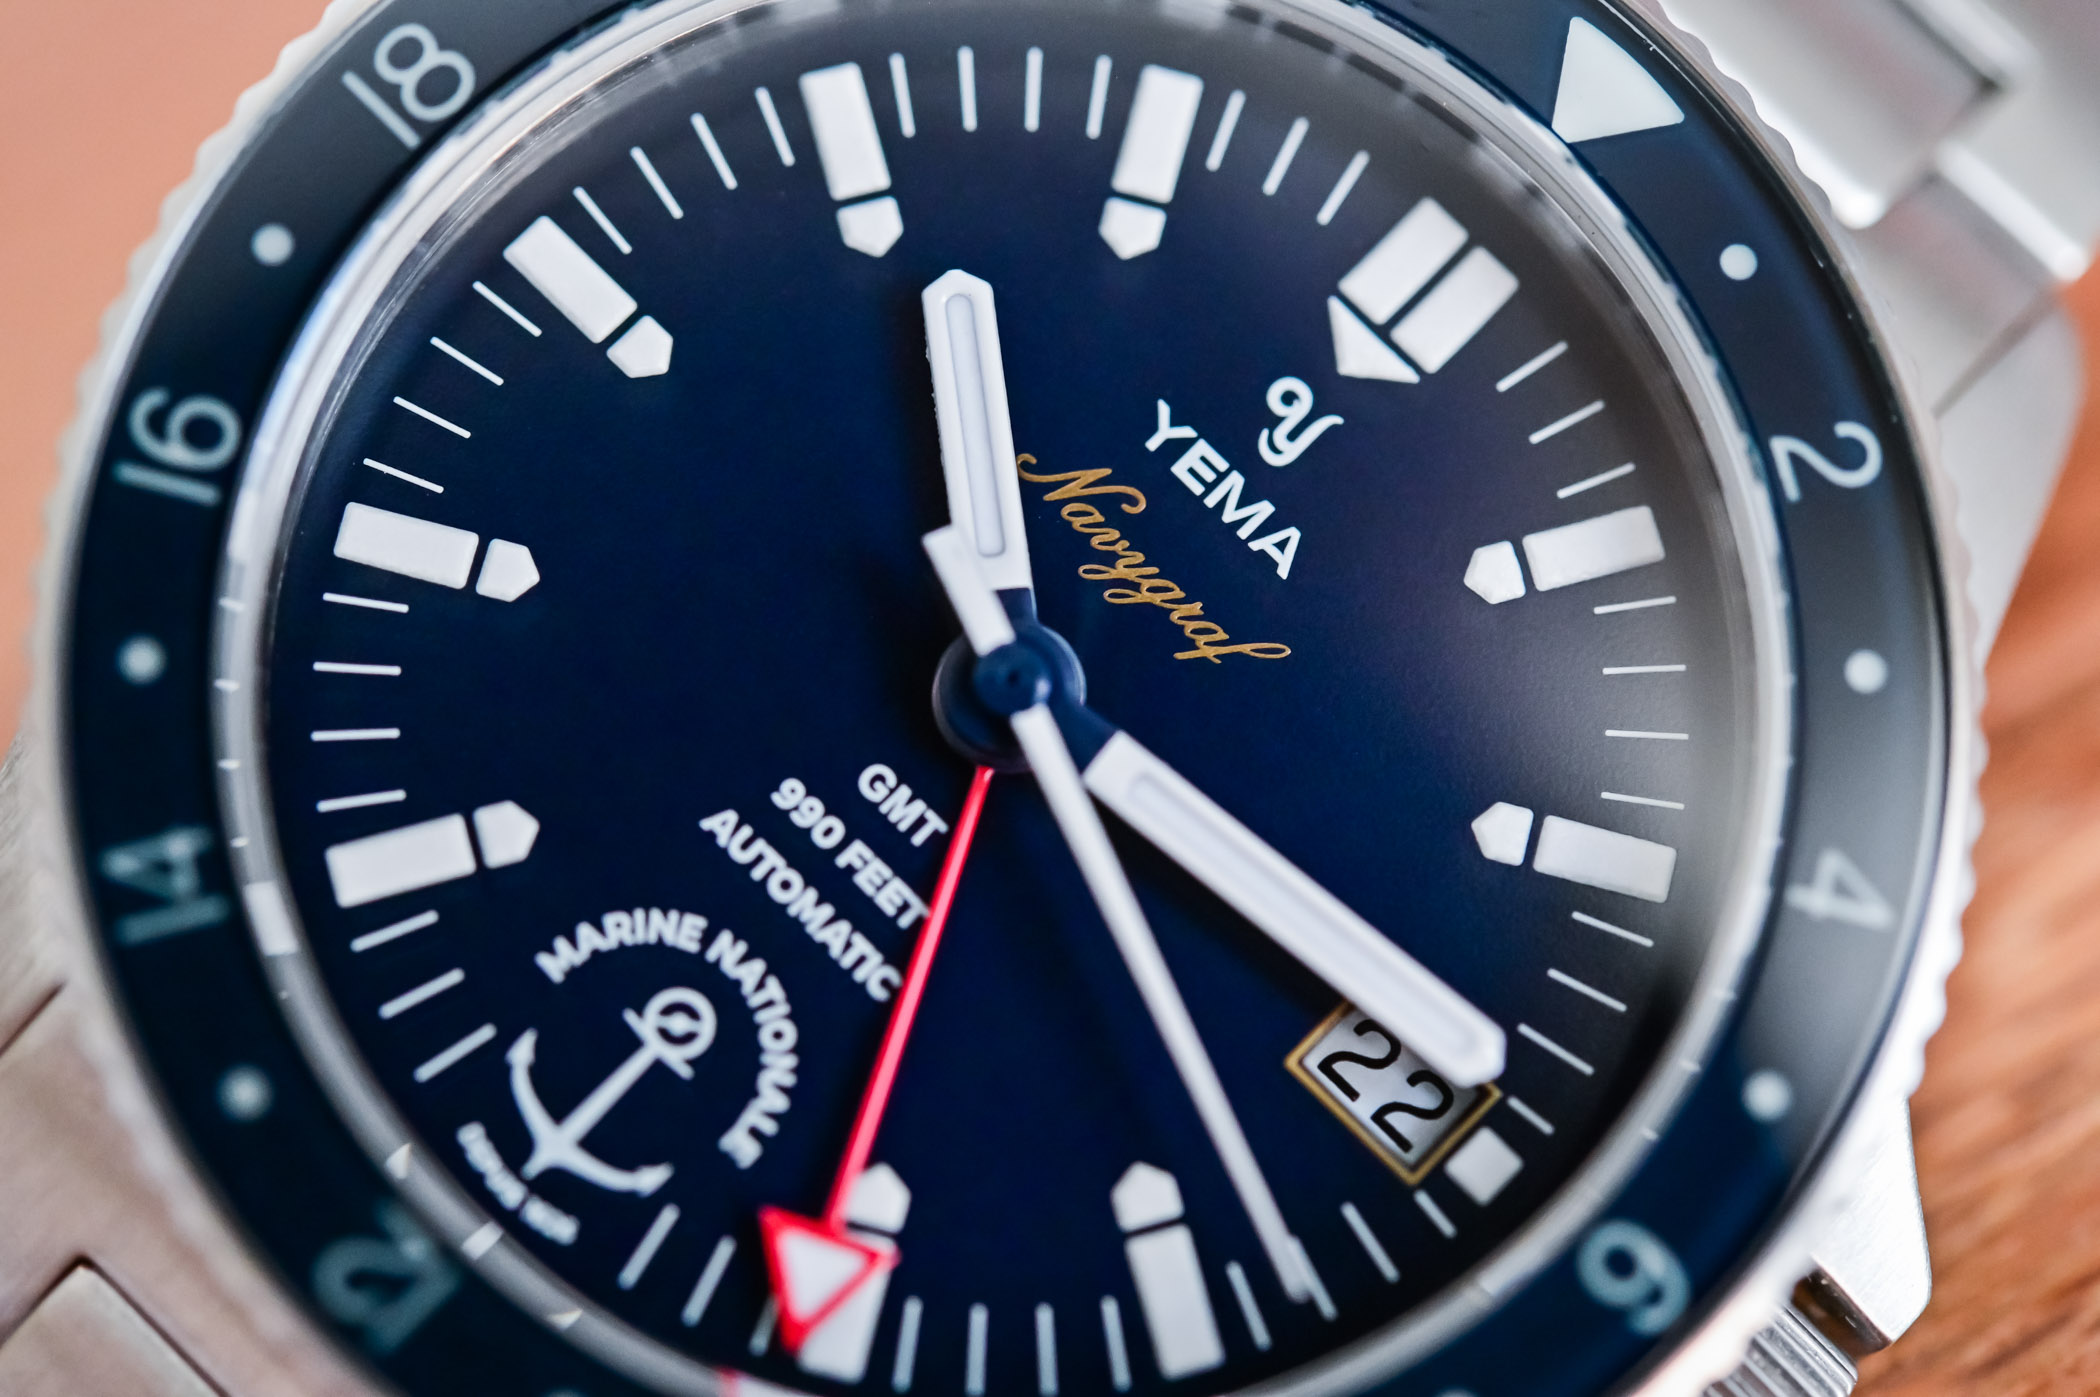 Yema Navygraf Marine Nationale GMT